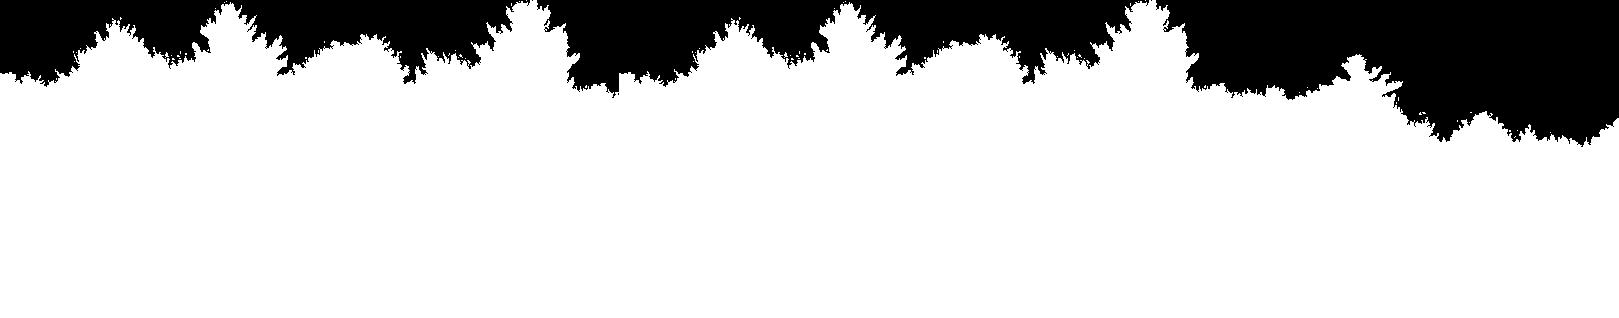 treepage.png